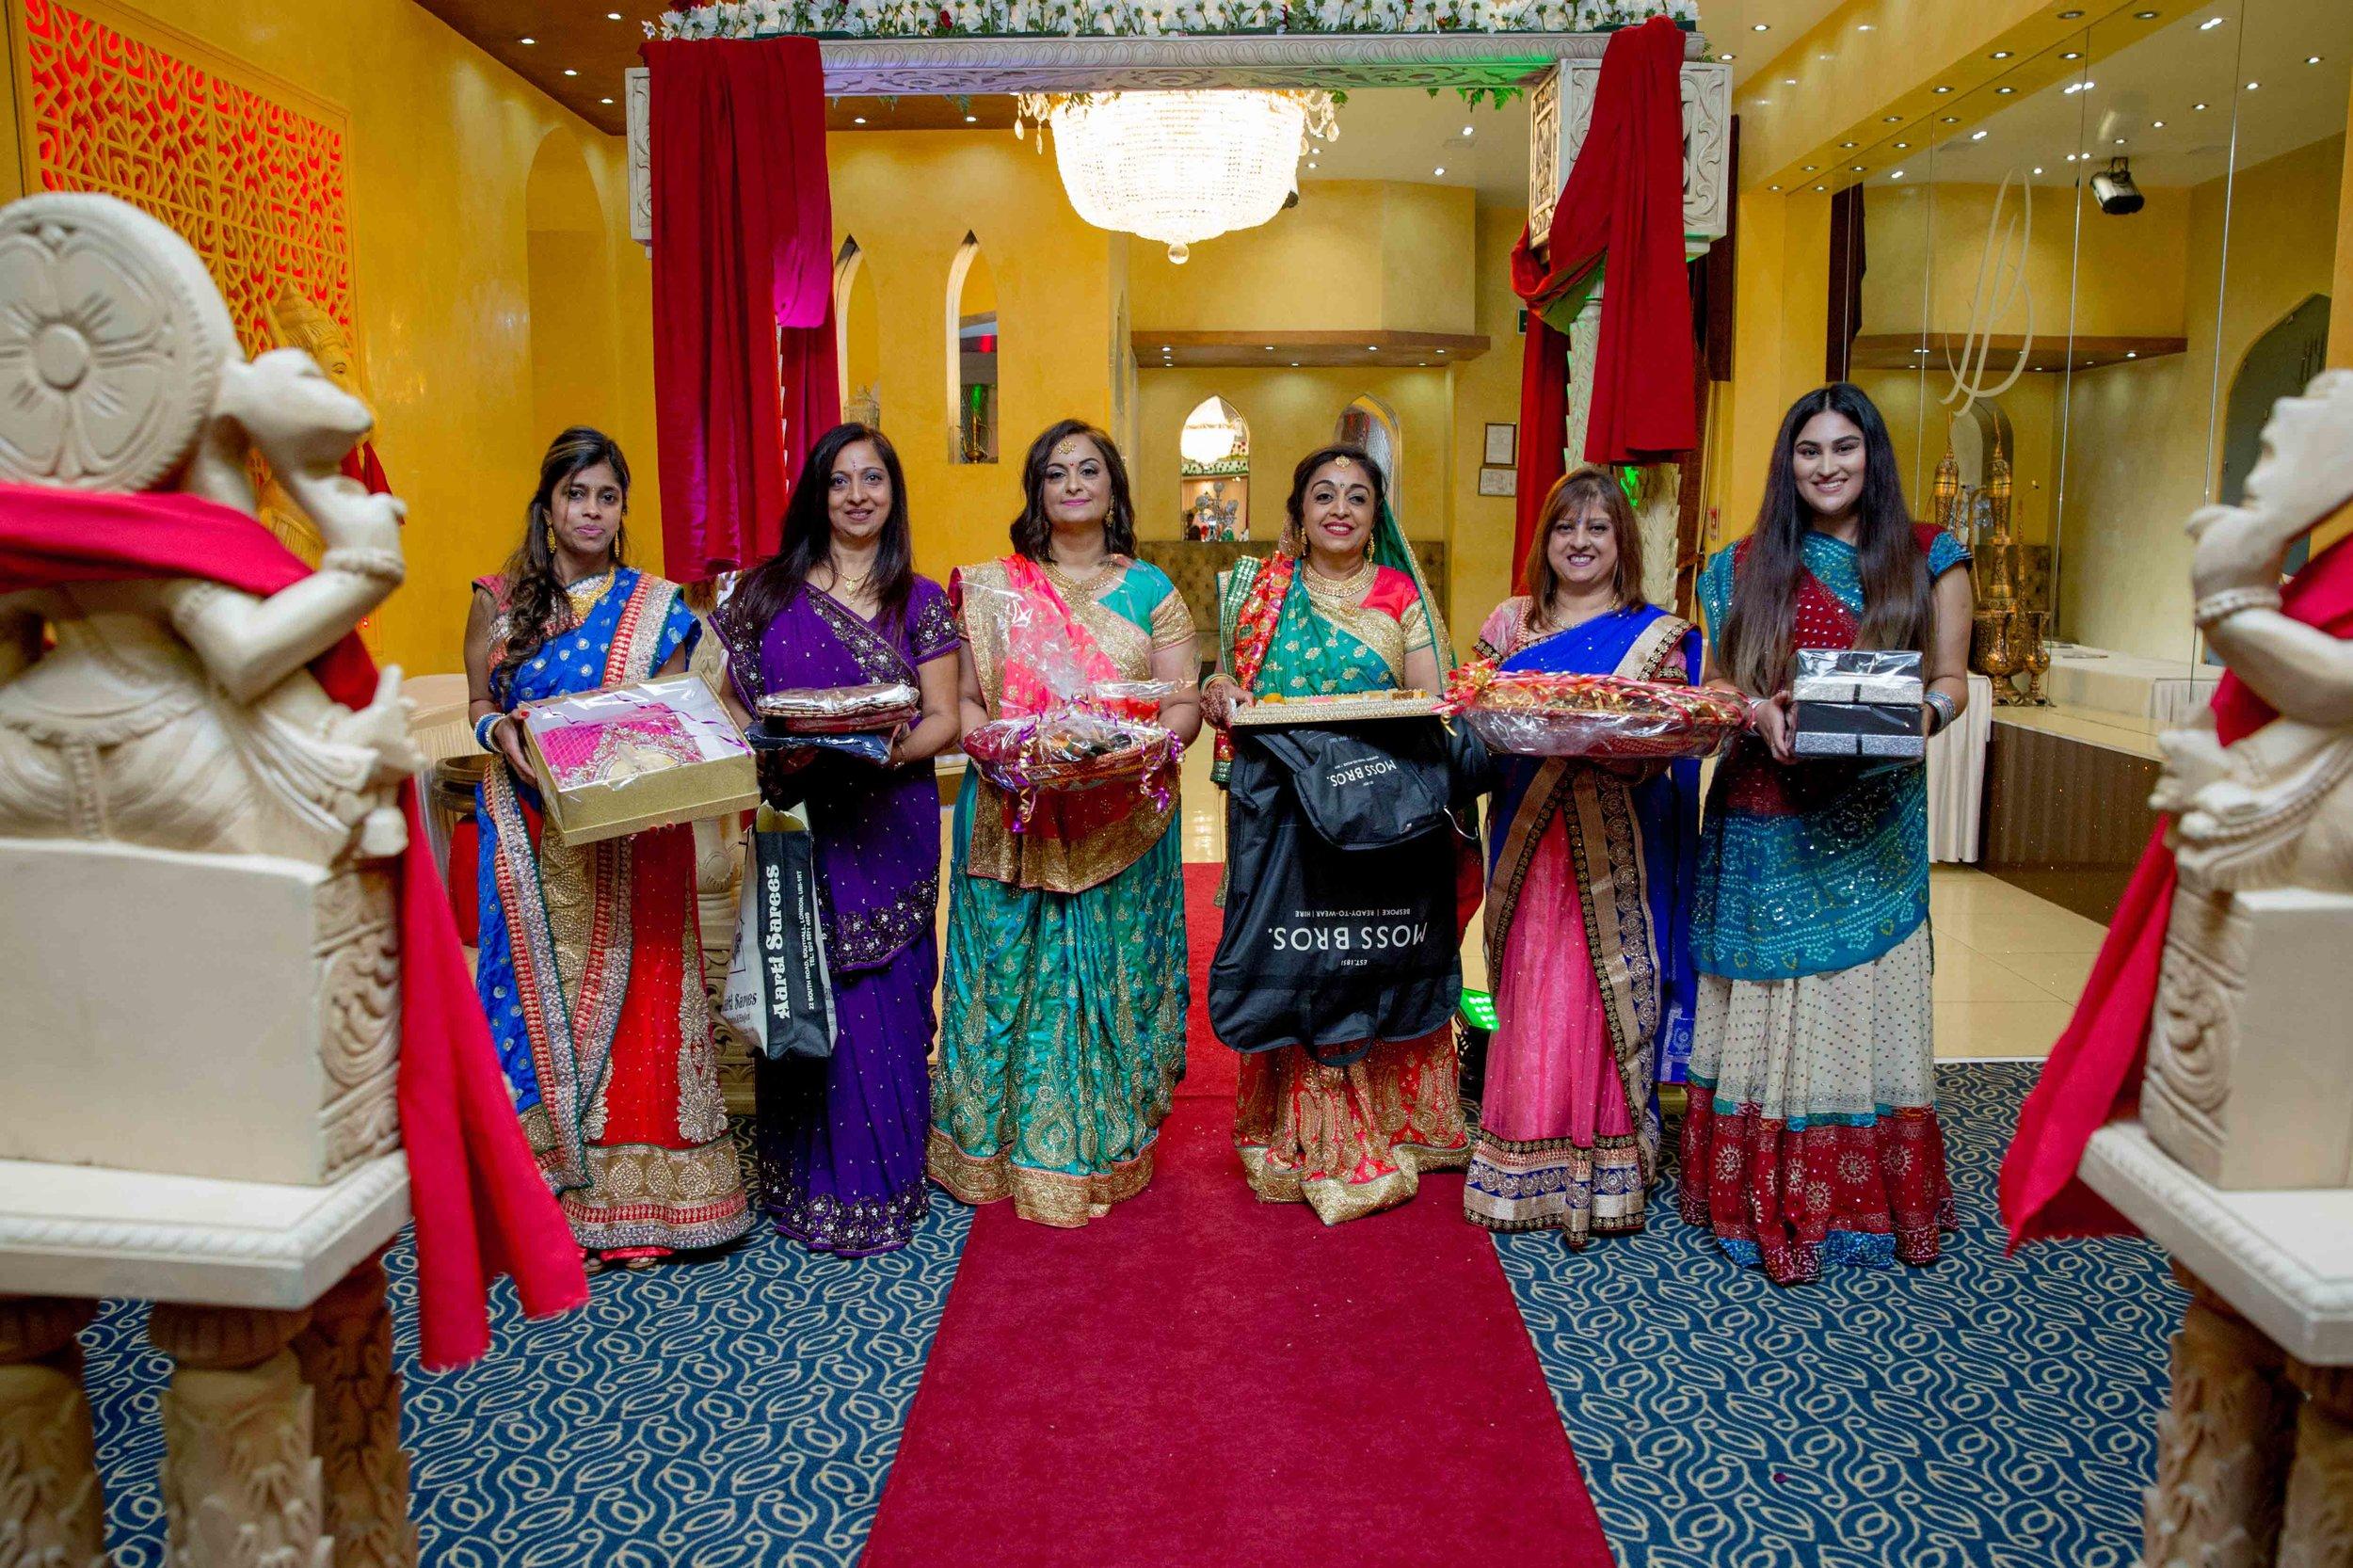 premier-banquetting-london-Hindu-asian-wedding-photographer-natalia-smith-photography-23.jpg